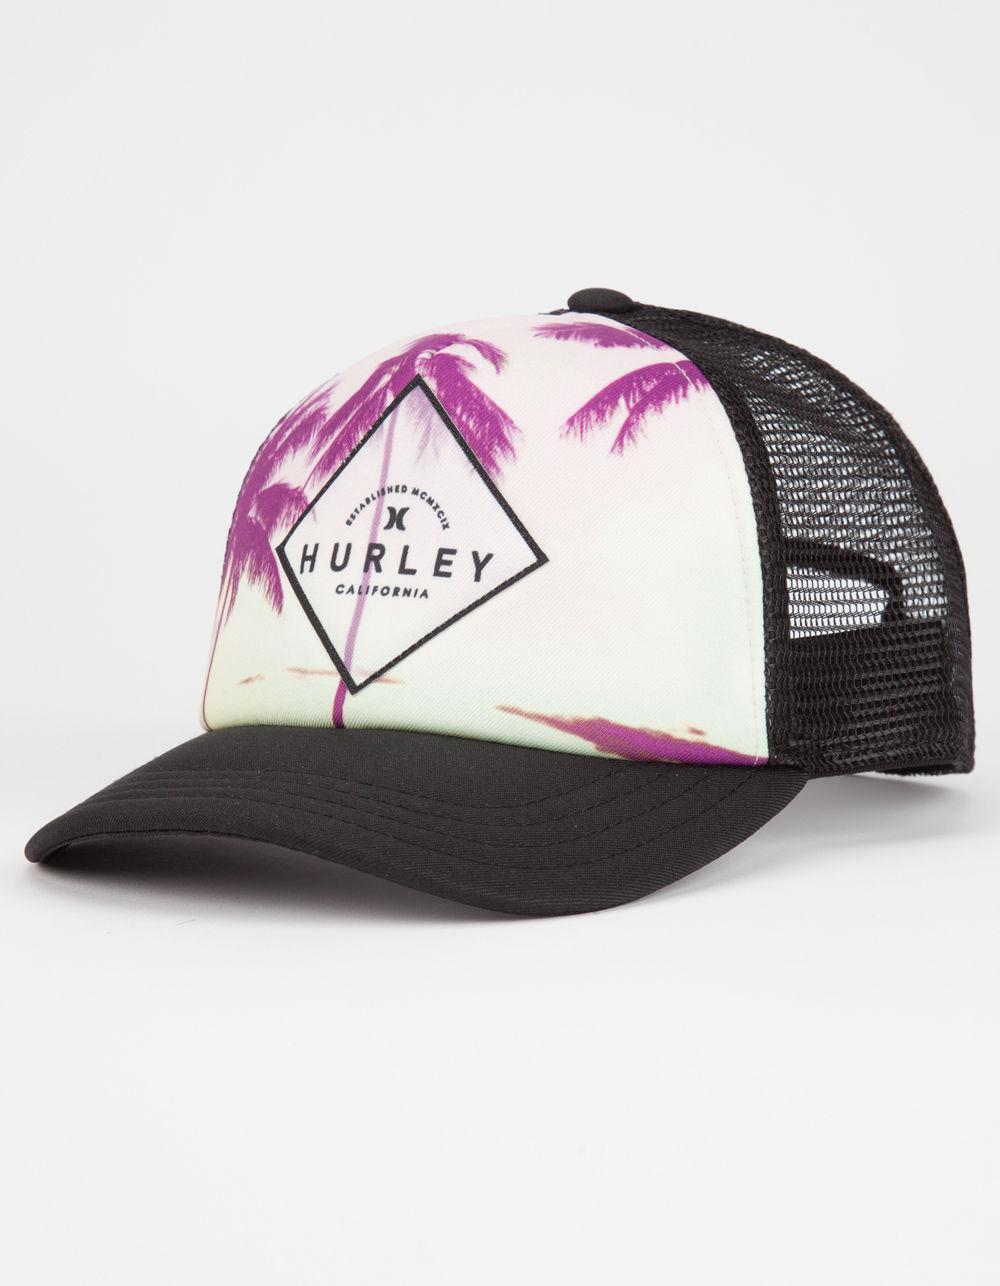 1f0ea3b576c21 ... australia lyst hurley goldenwest womens trucker hat in black 9753d  1c323 ...